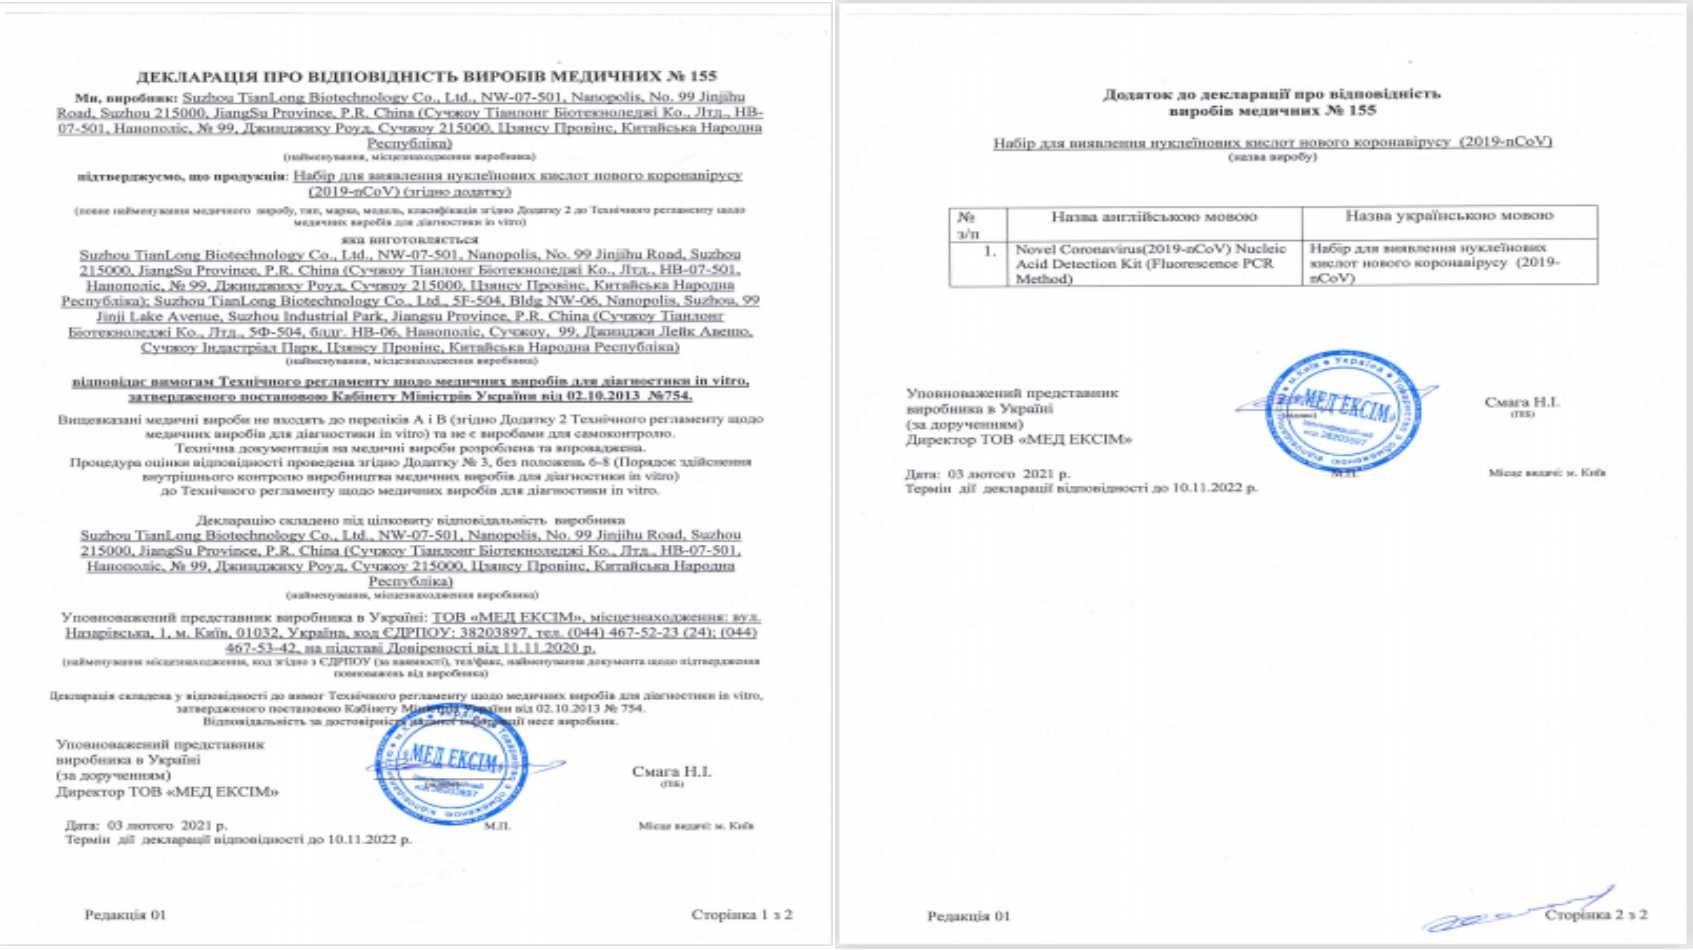 Ukraine EUA certificate for COVID-19 Detection Kits